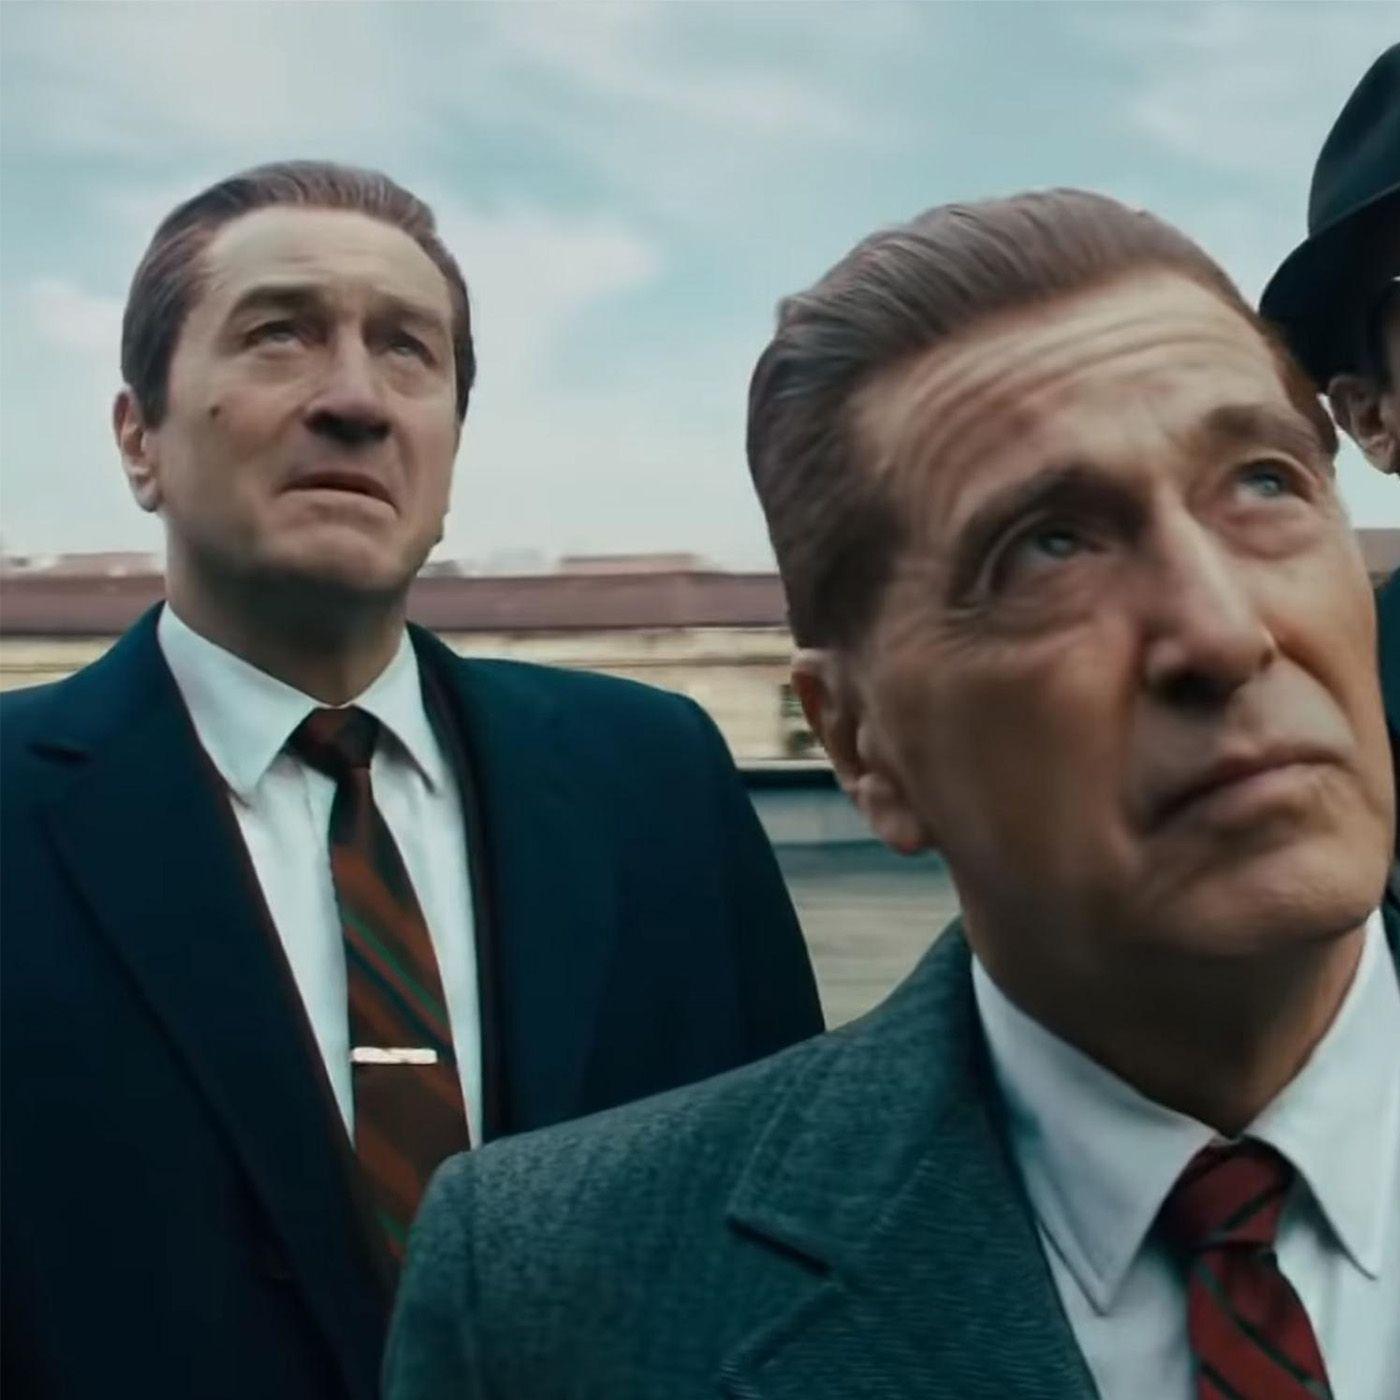 6. Scorsese & Marvel: Civil War (The Irishman)